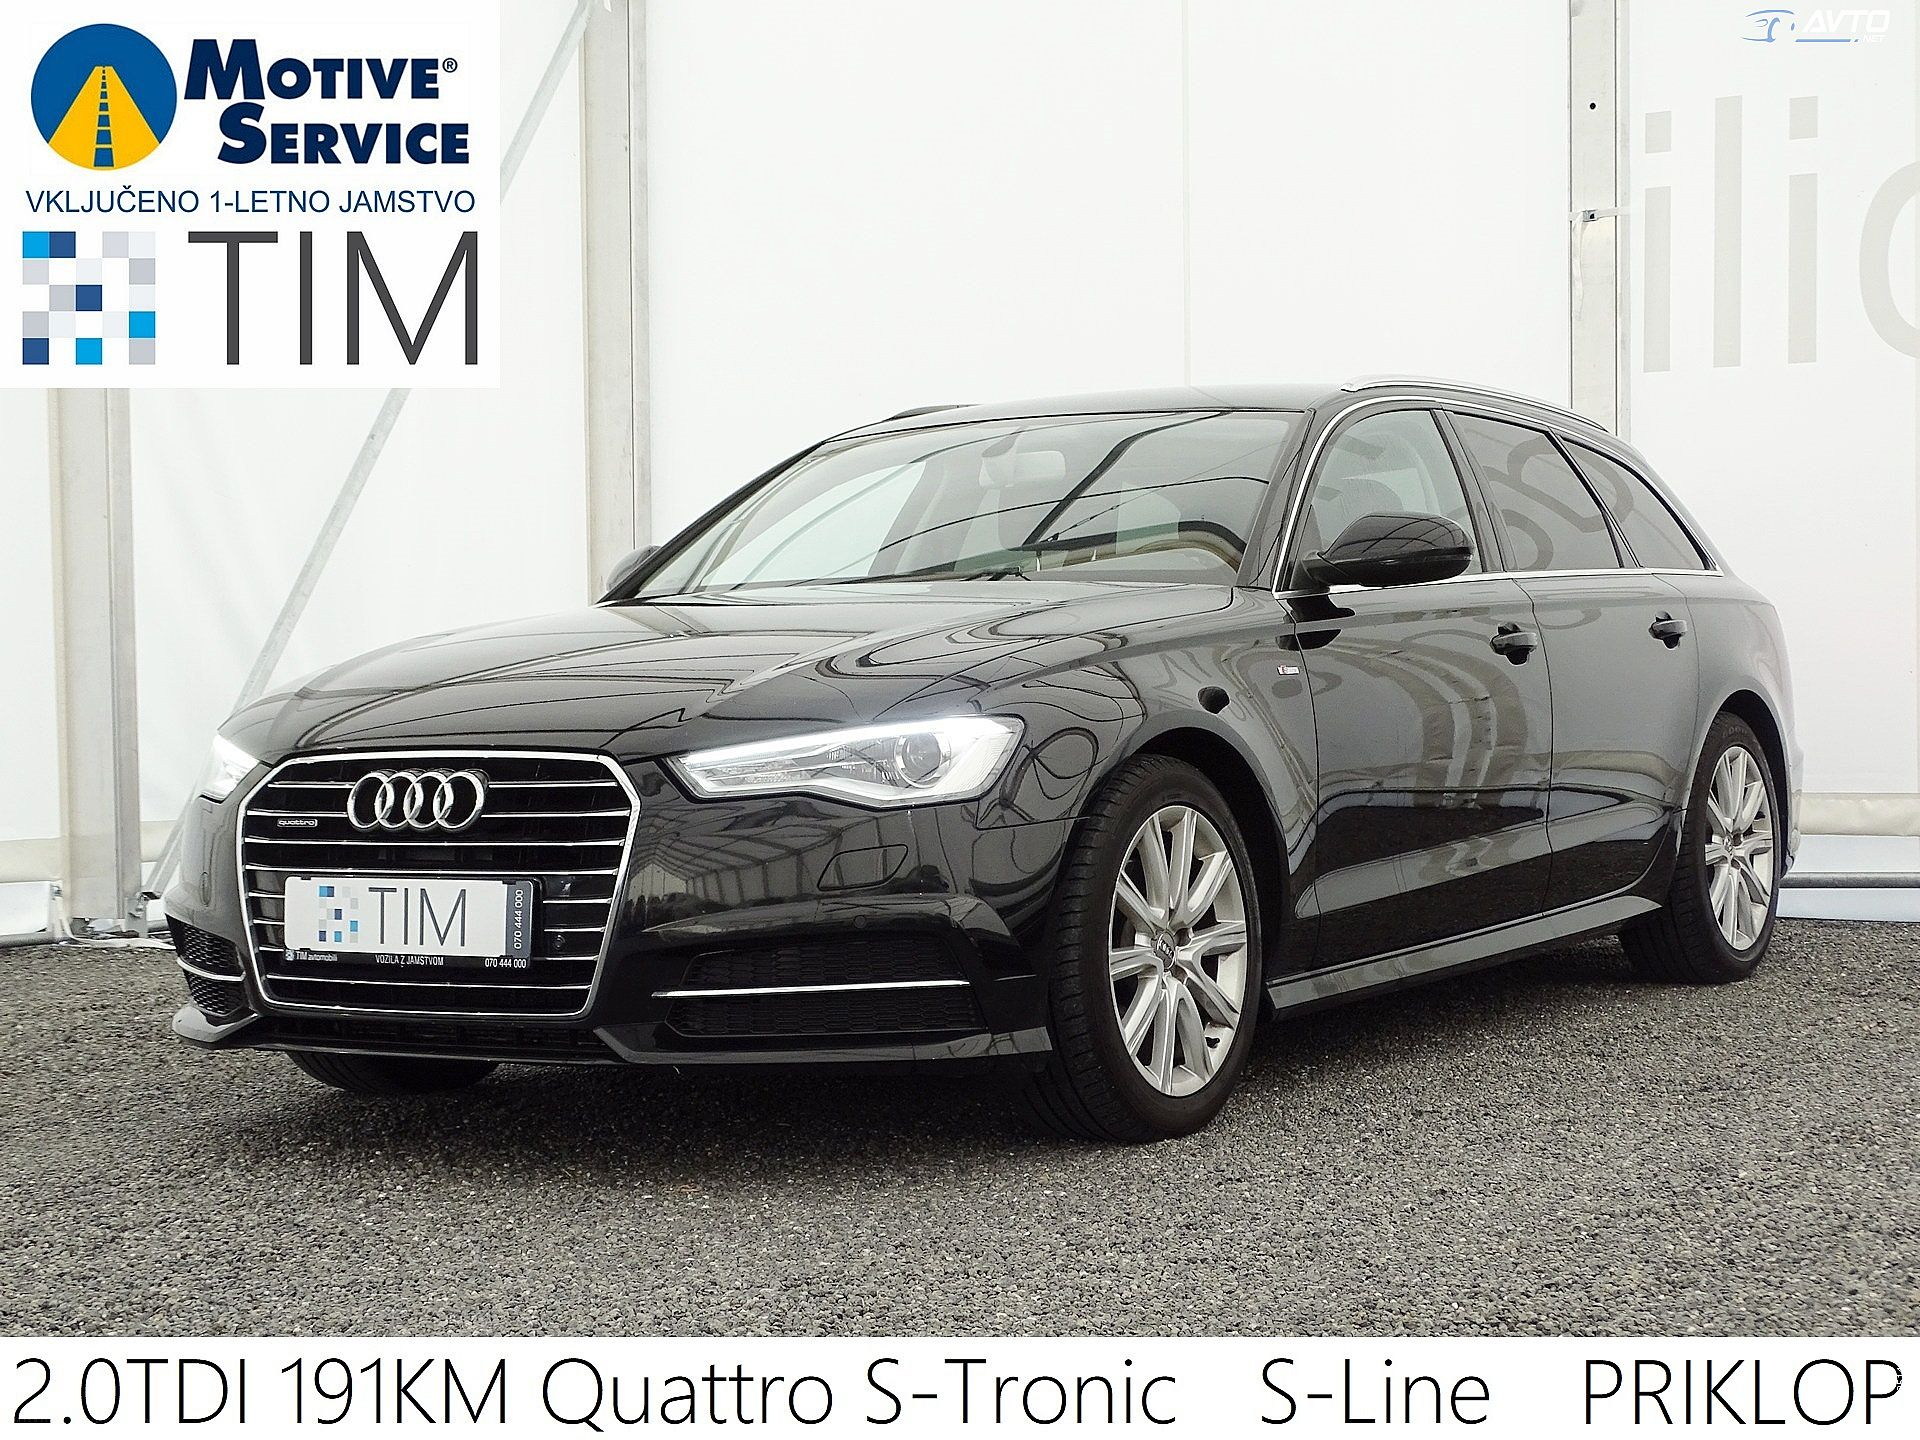 Audi A6 Avant 2.0 TDI Ultra Quattr S-Tronic